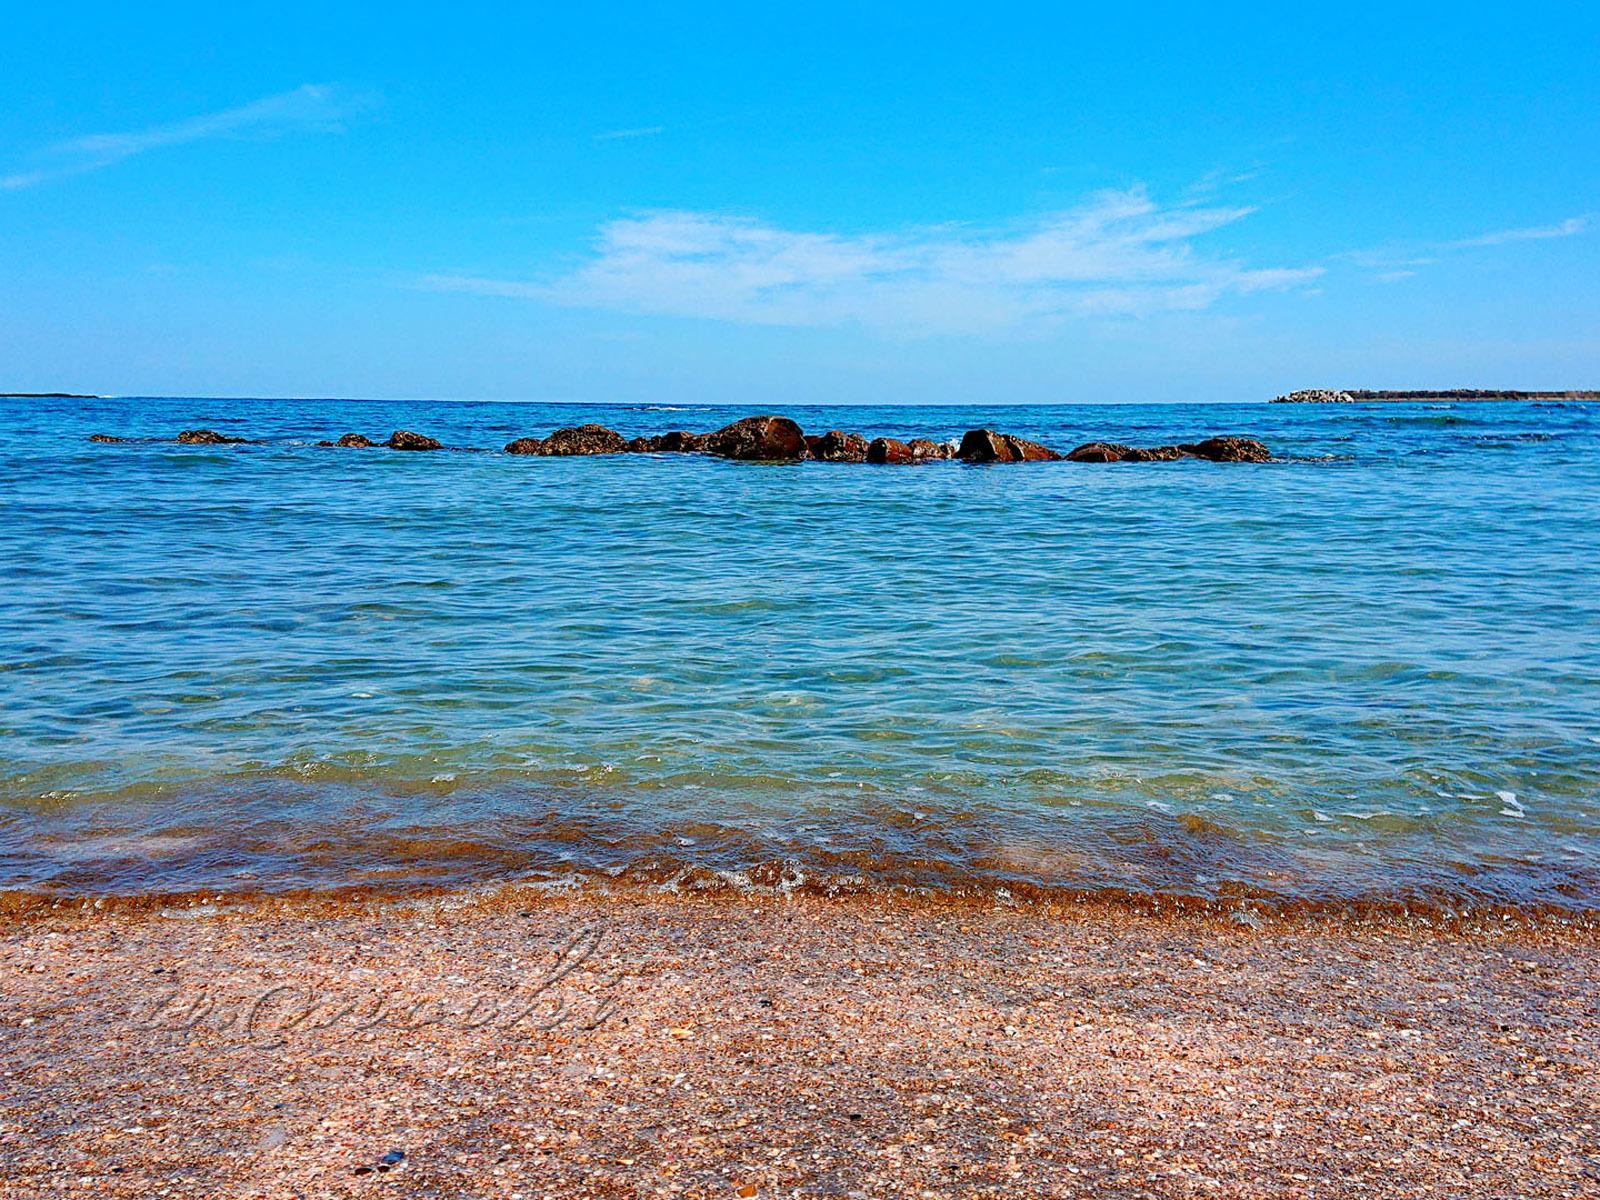 aoshima_coast2.jpg